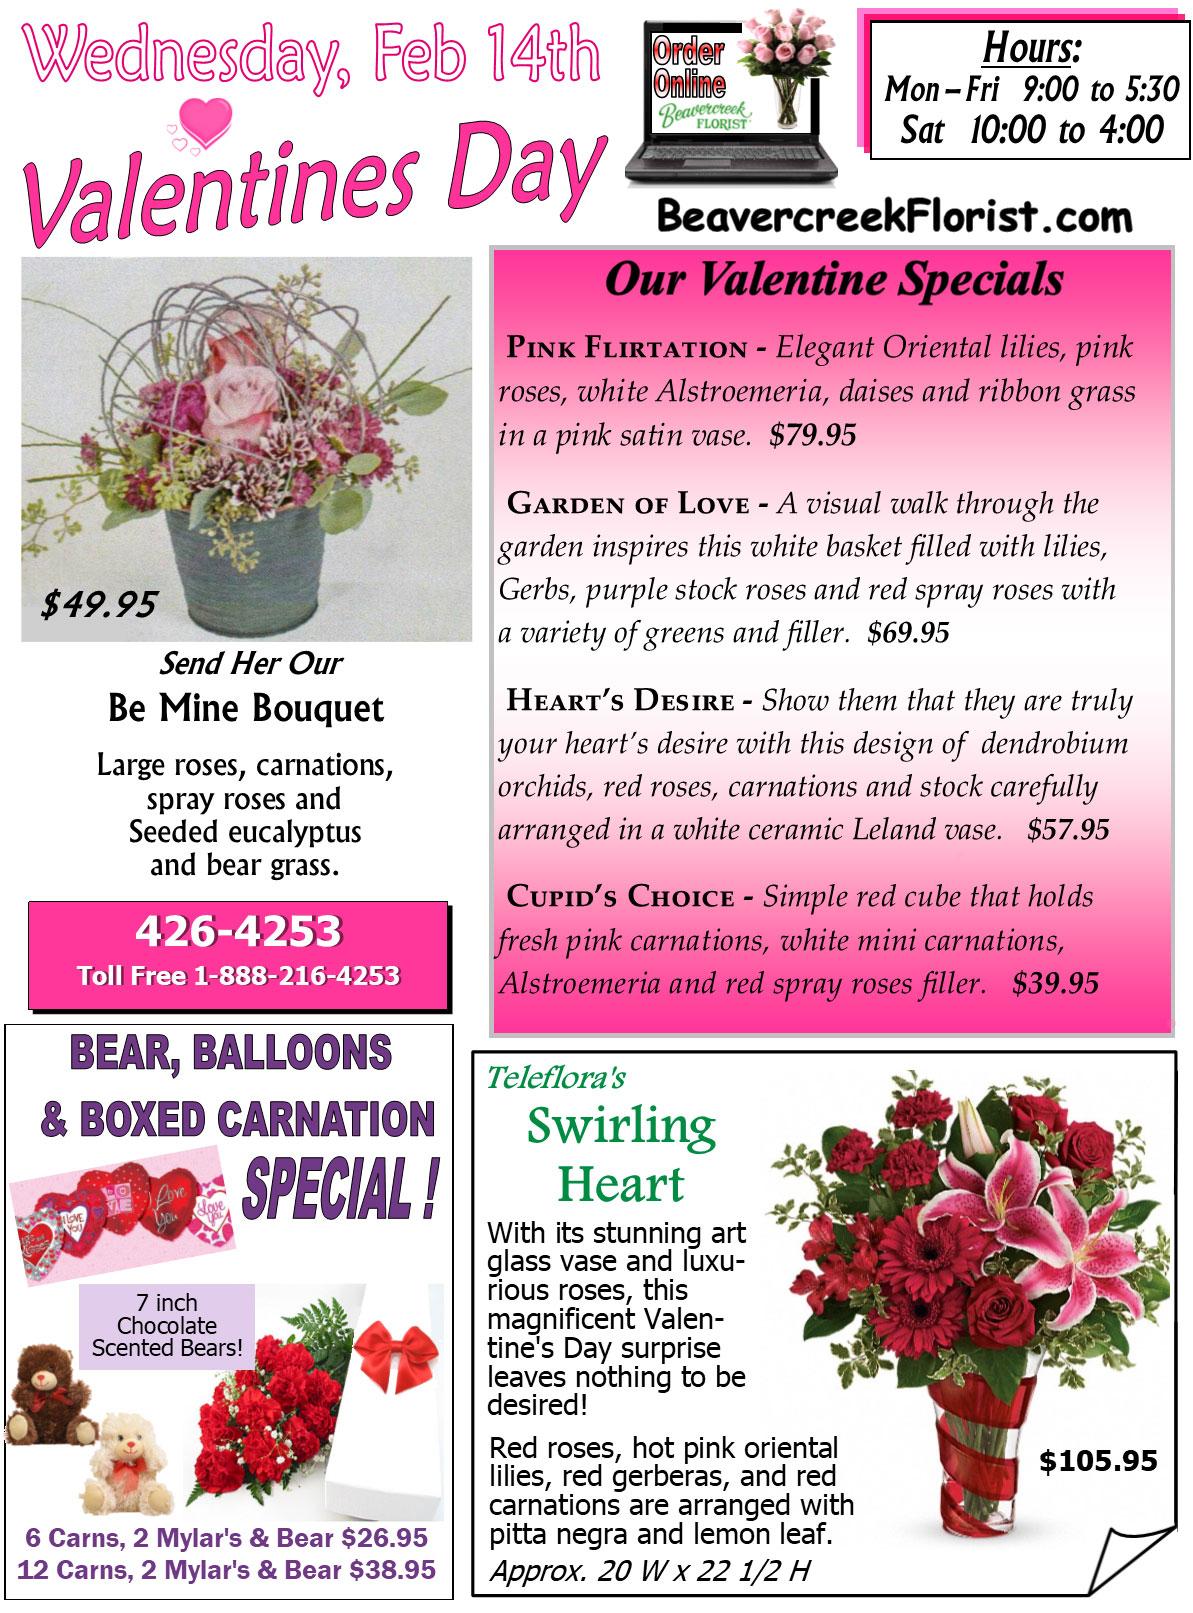 February Events from Beavercreek Florist